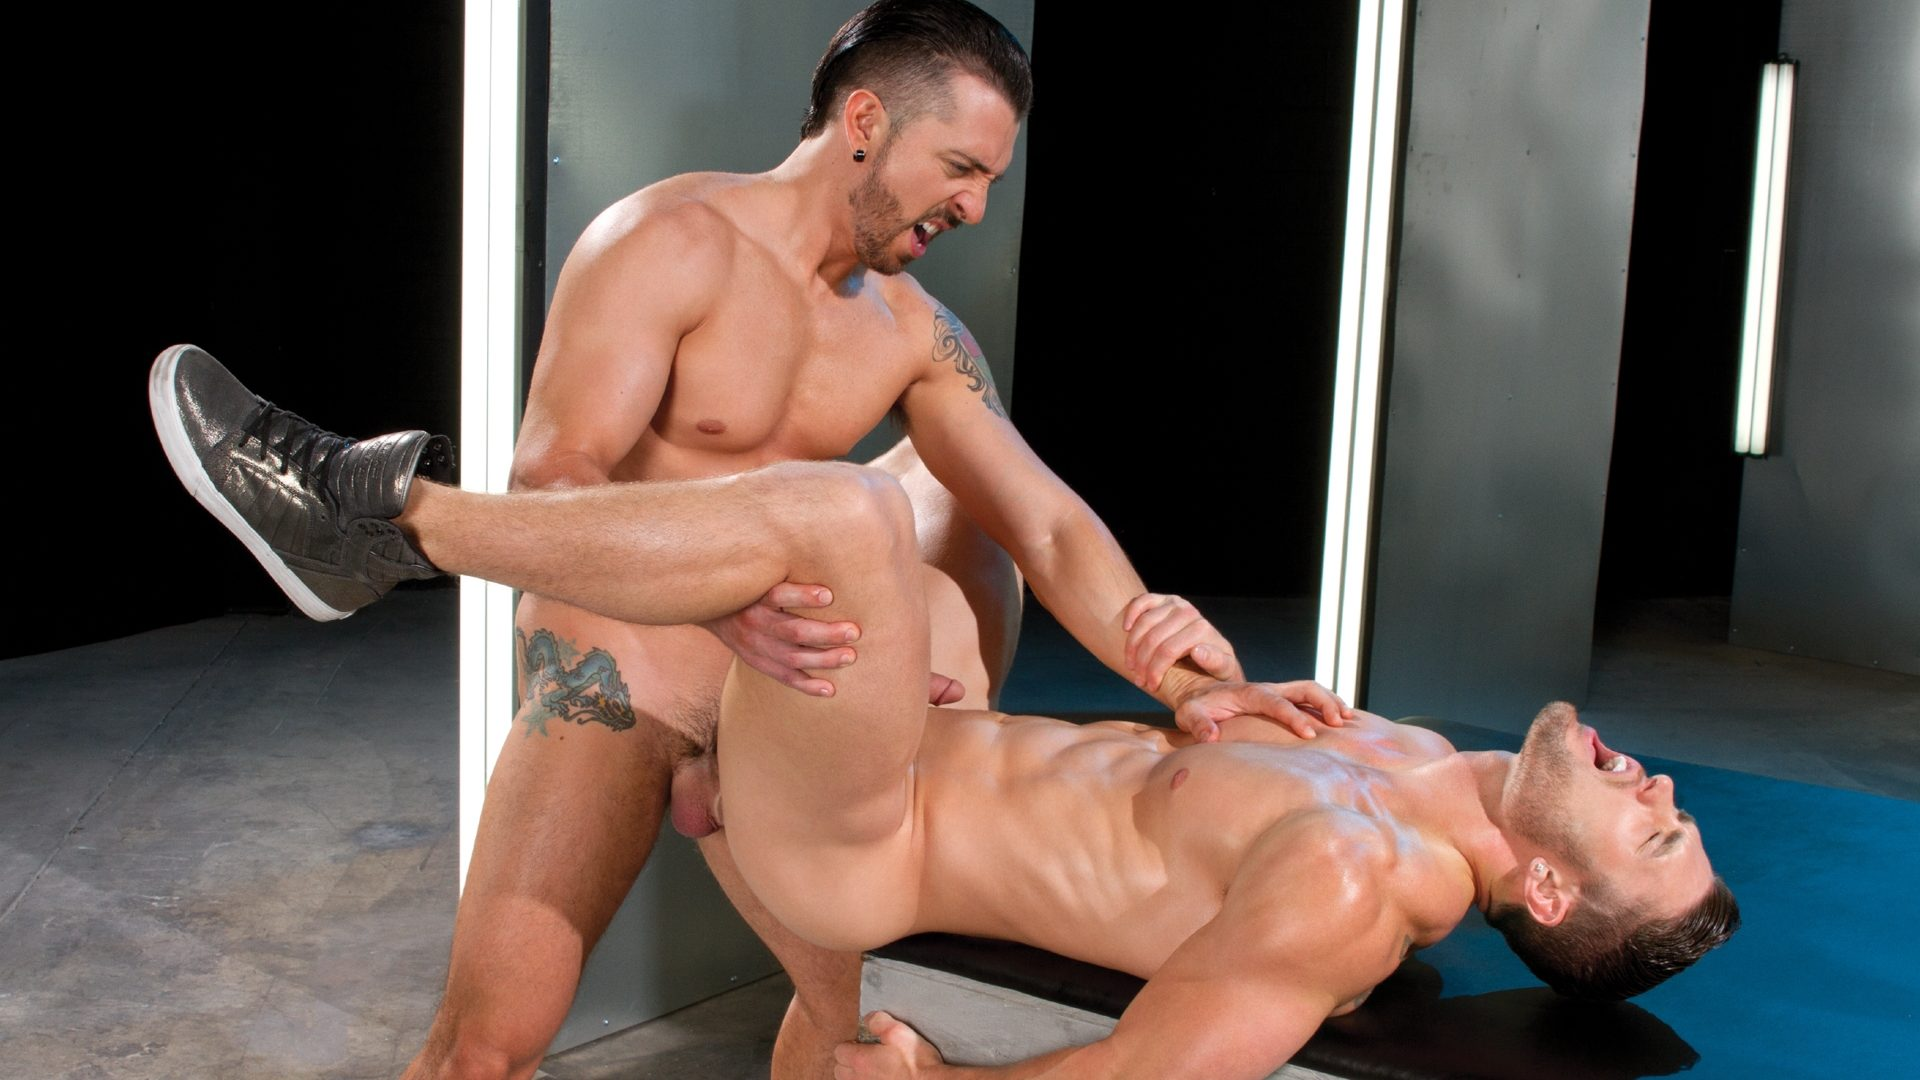 Jimmy Durano and Ryan Rose